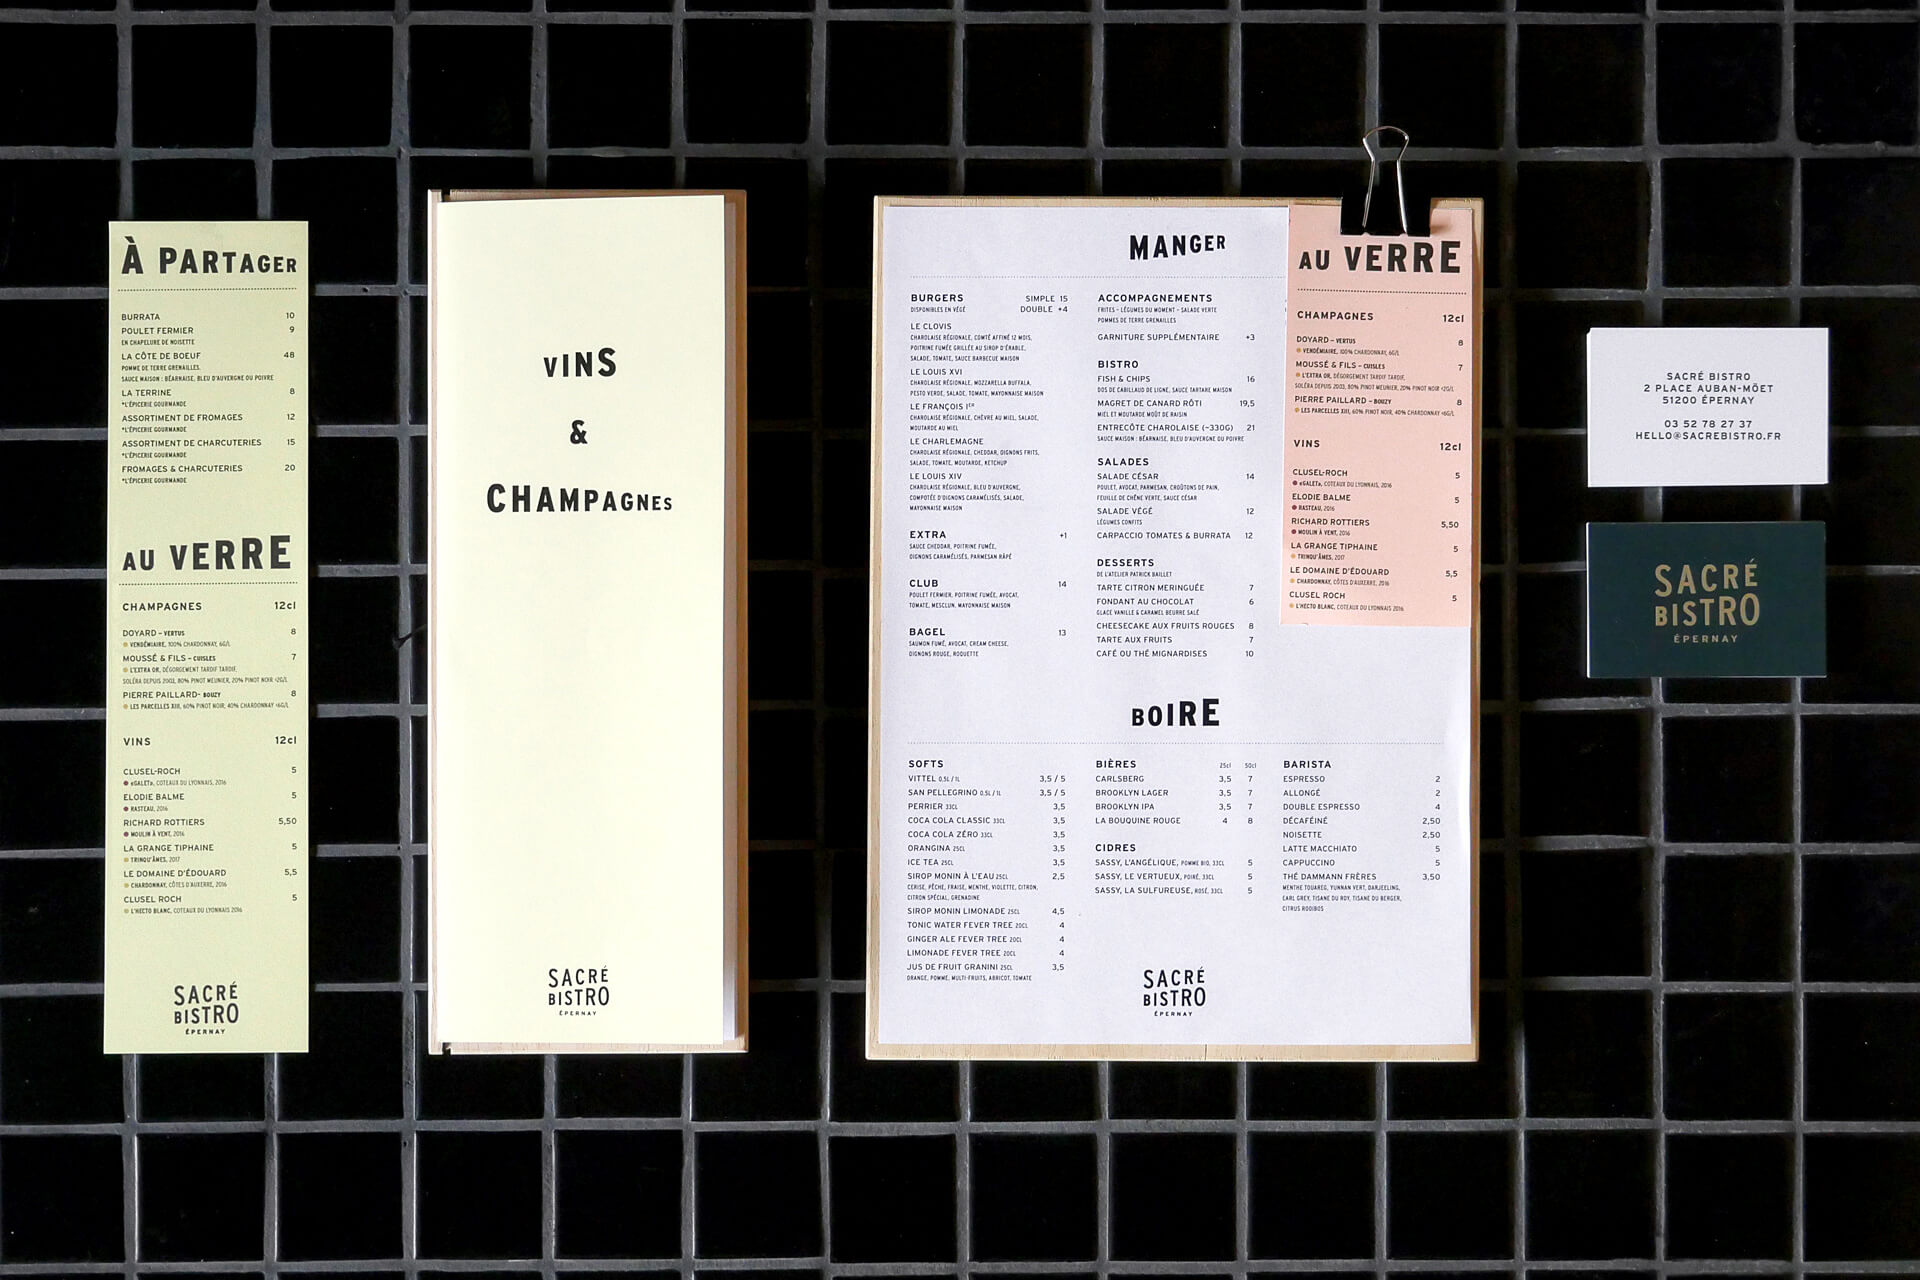 sacre-bistro-plastac-menu-papeterie